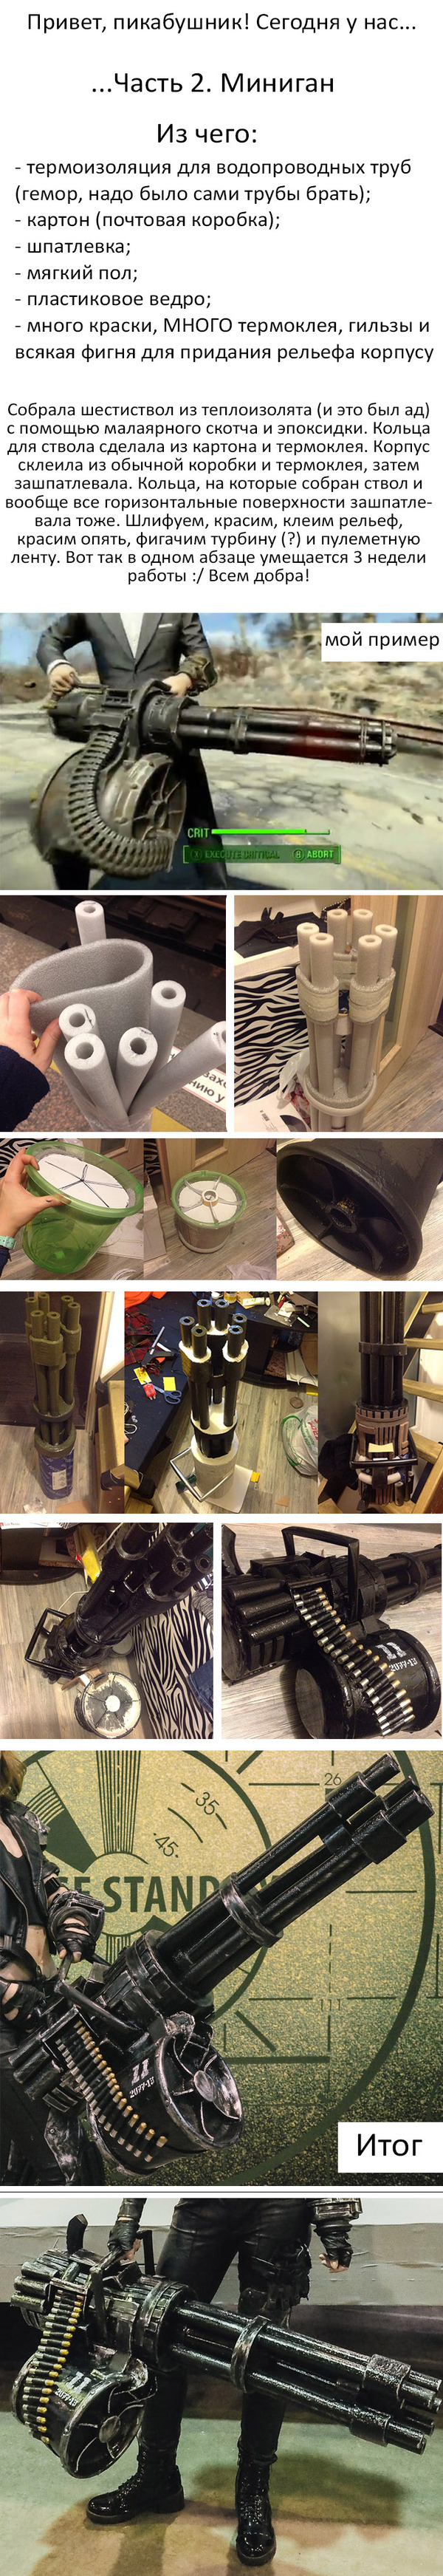 Миниган своими руками: фотопроцесс Minigun, Fallout, Косплей, Длиннопост